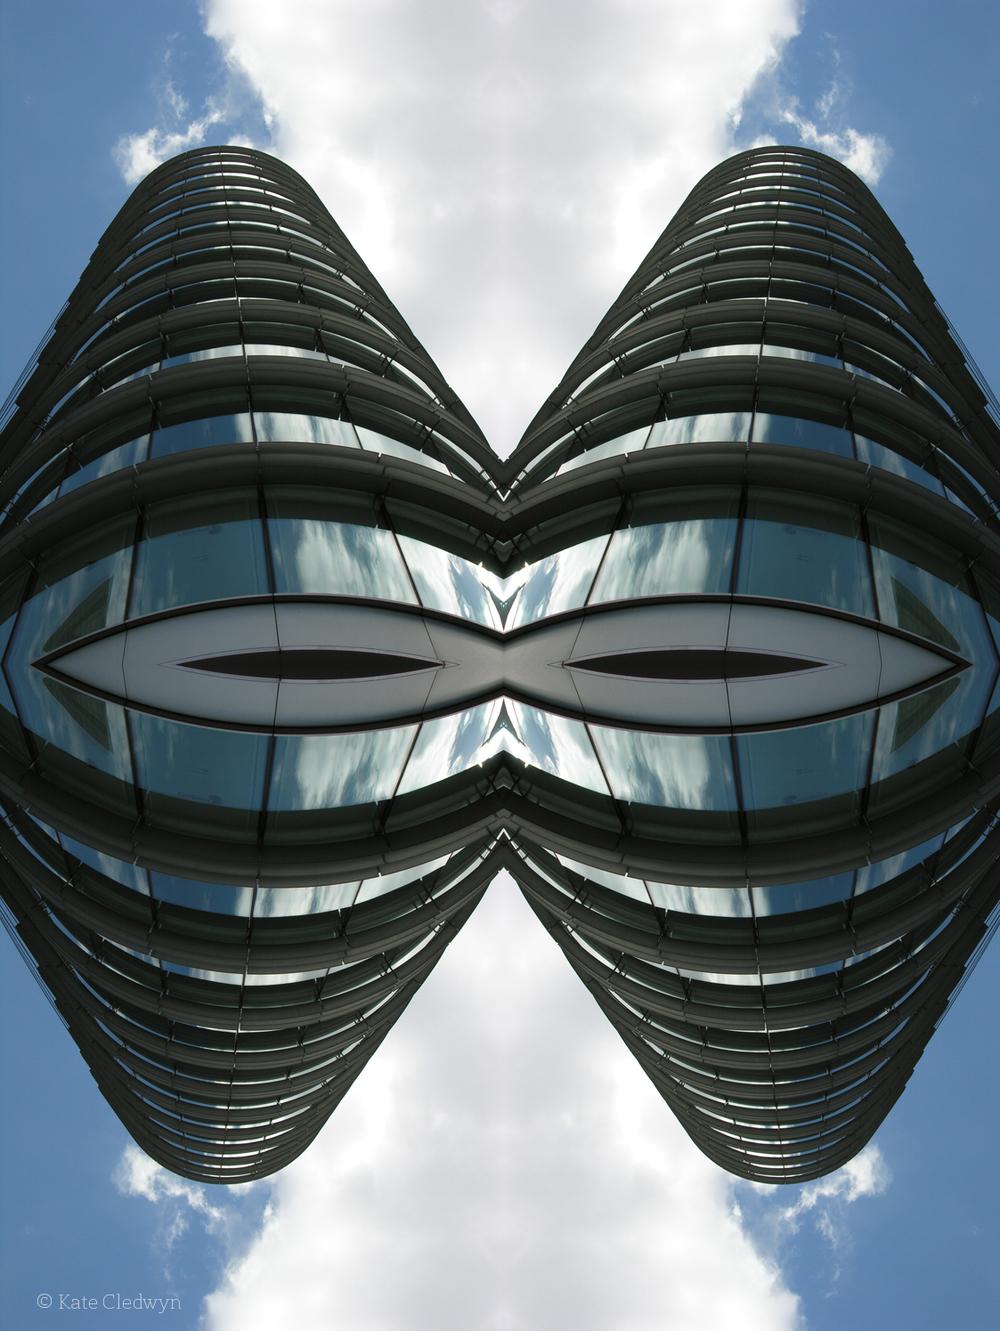 Towering 2